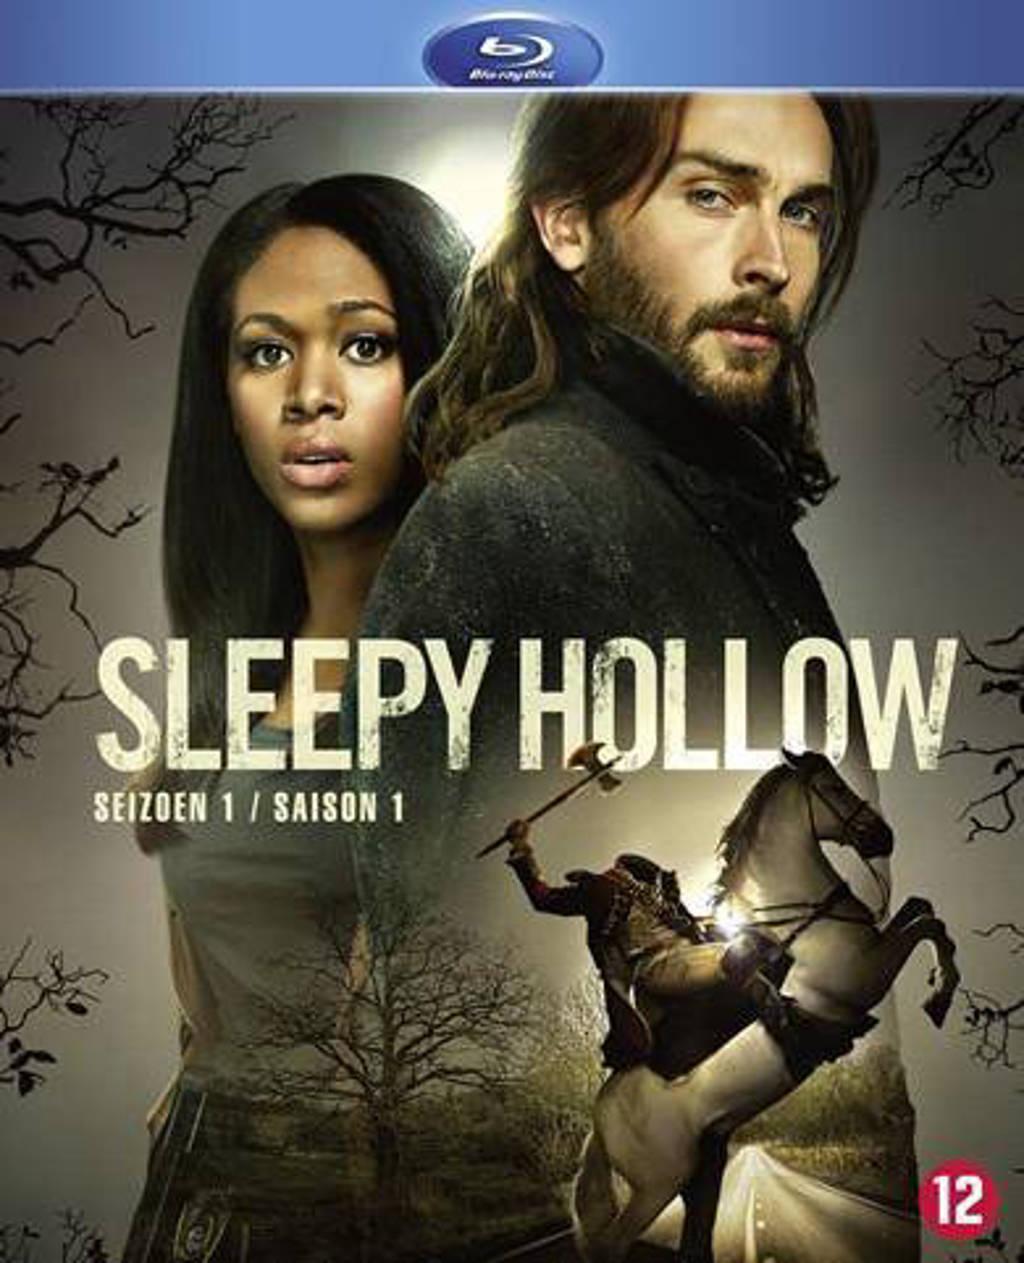 Sleepy hollow - Seizoen 1 (Blu-ray)